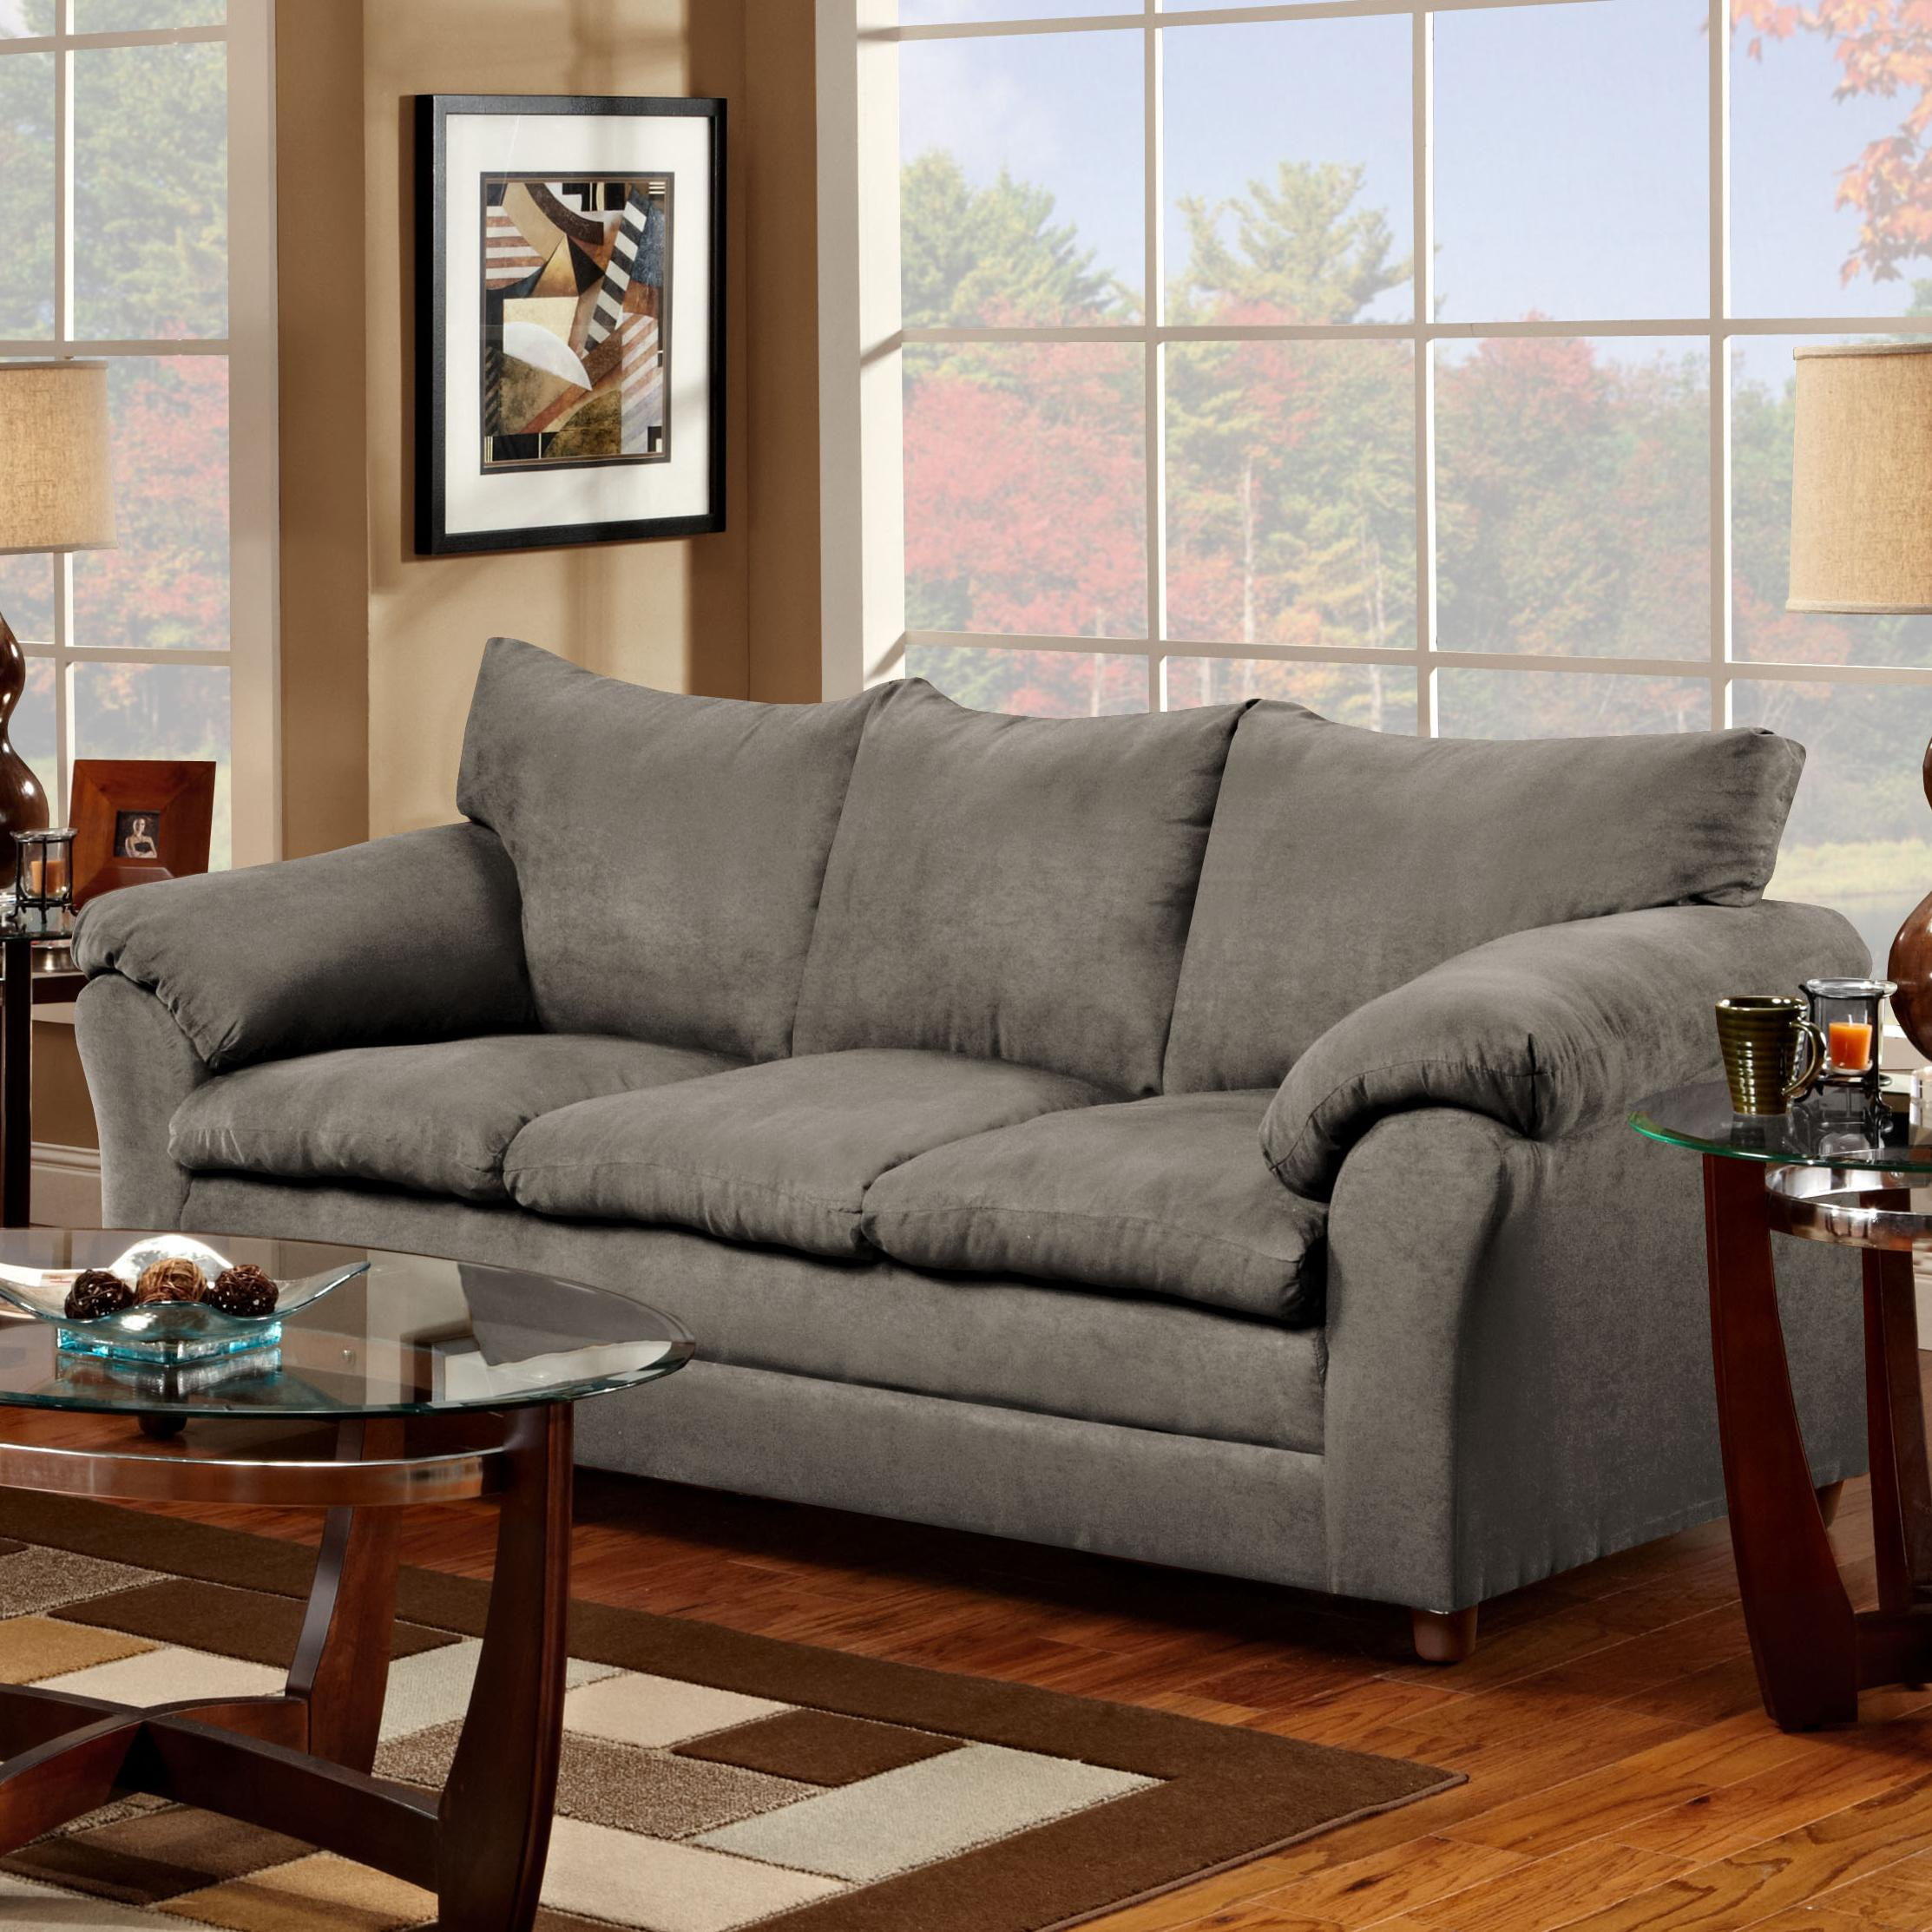 Washington Furniture 1150 Sofa - Item Number: 1150-S Graphite